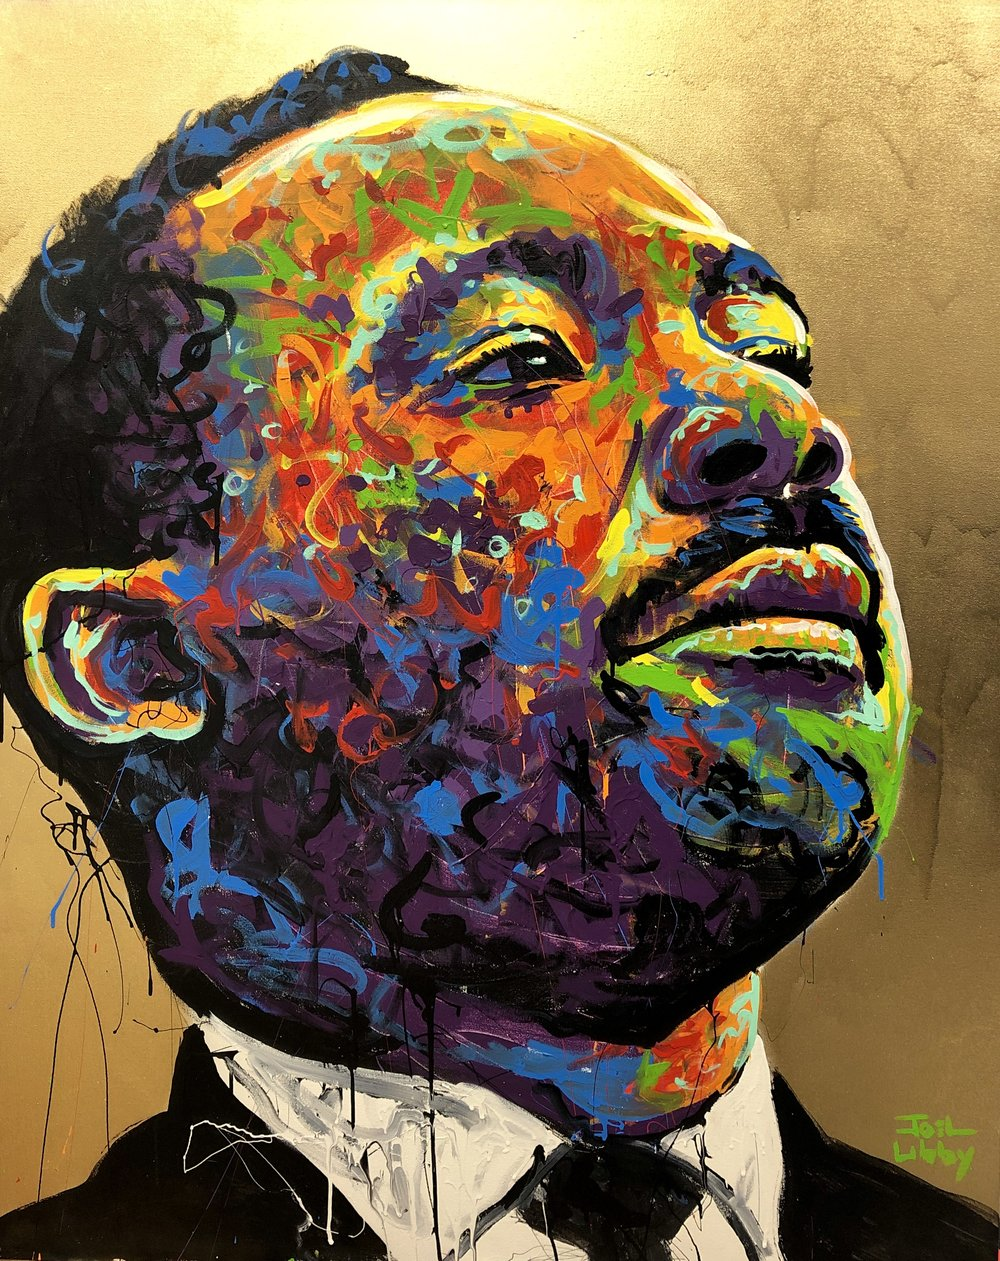 Dr. Martin Luther King, Jr. - Artwork by WWU Art Professor Joel Libby